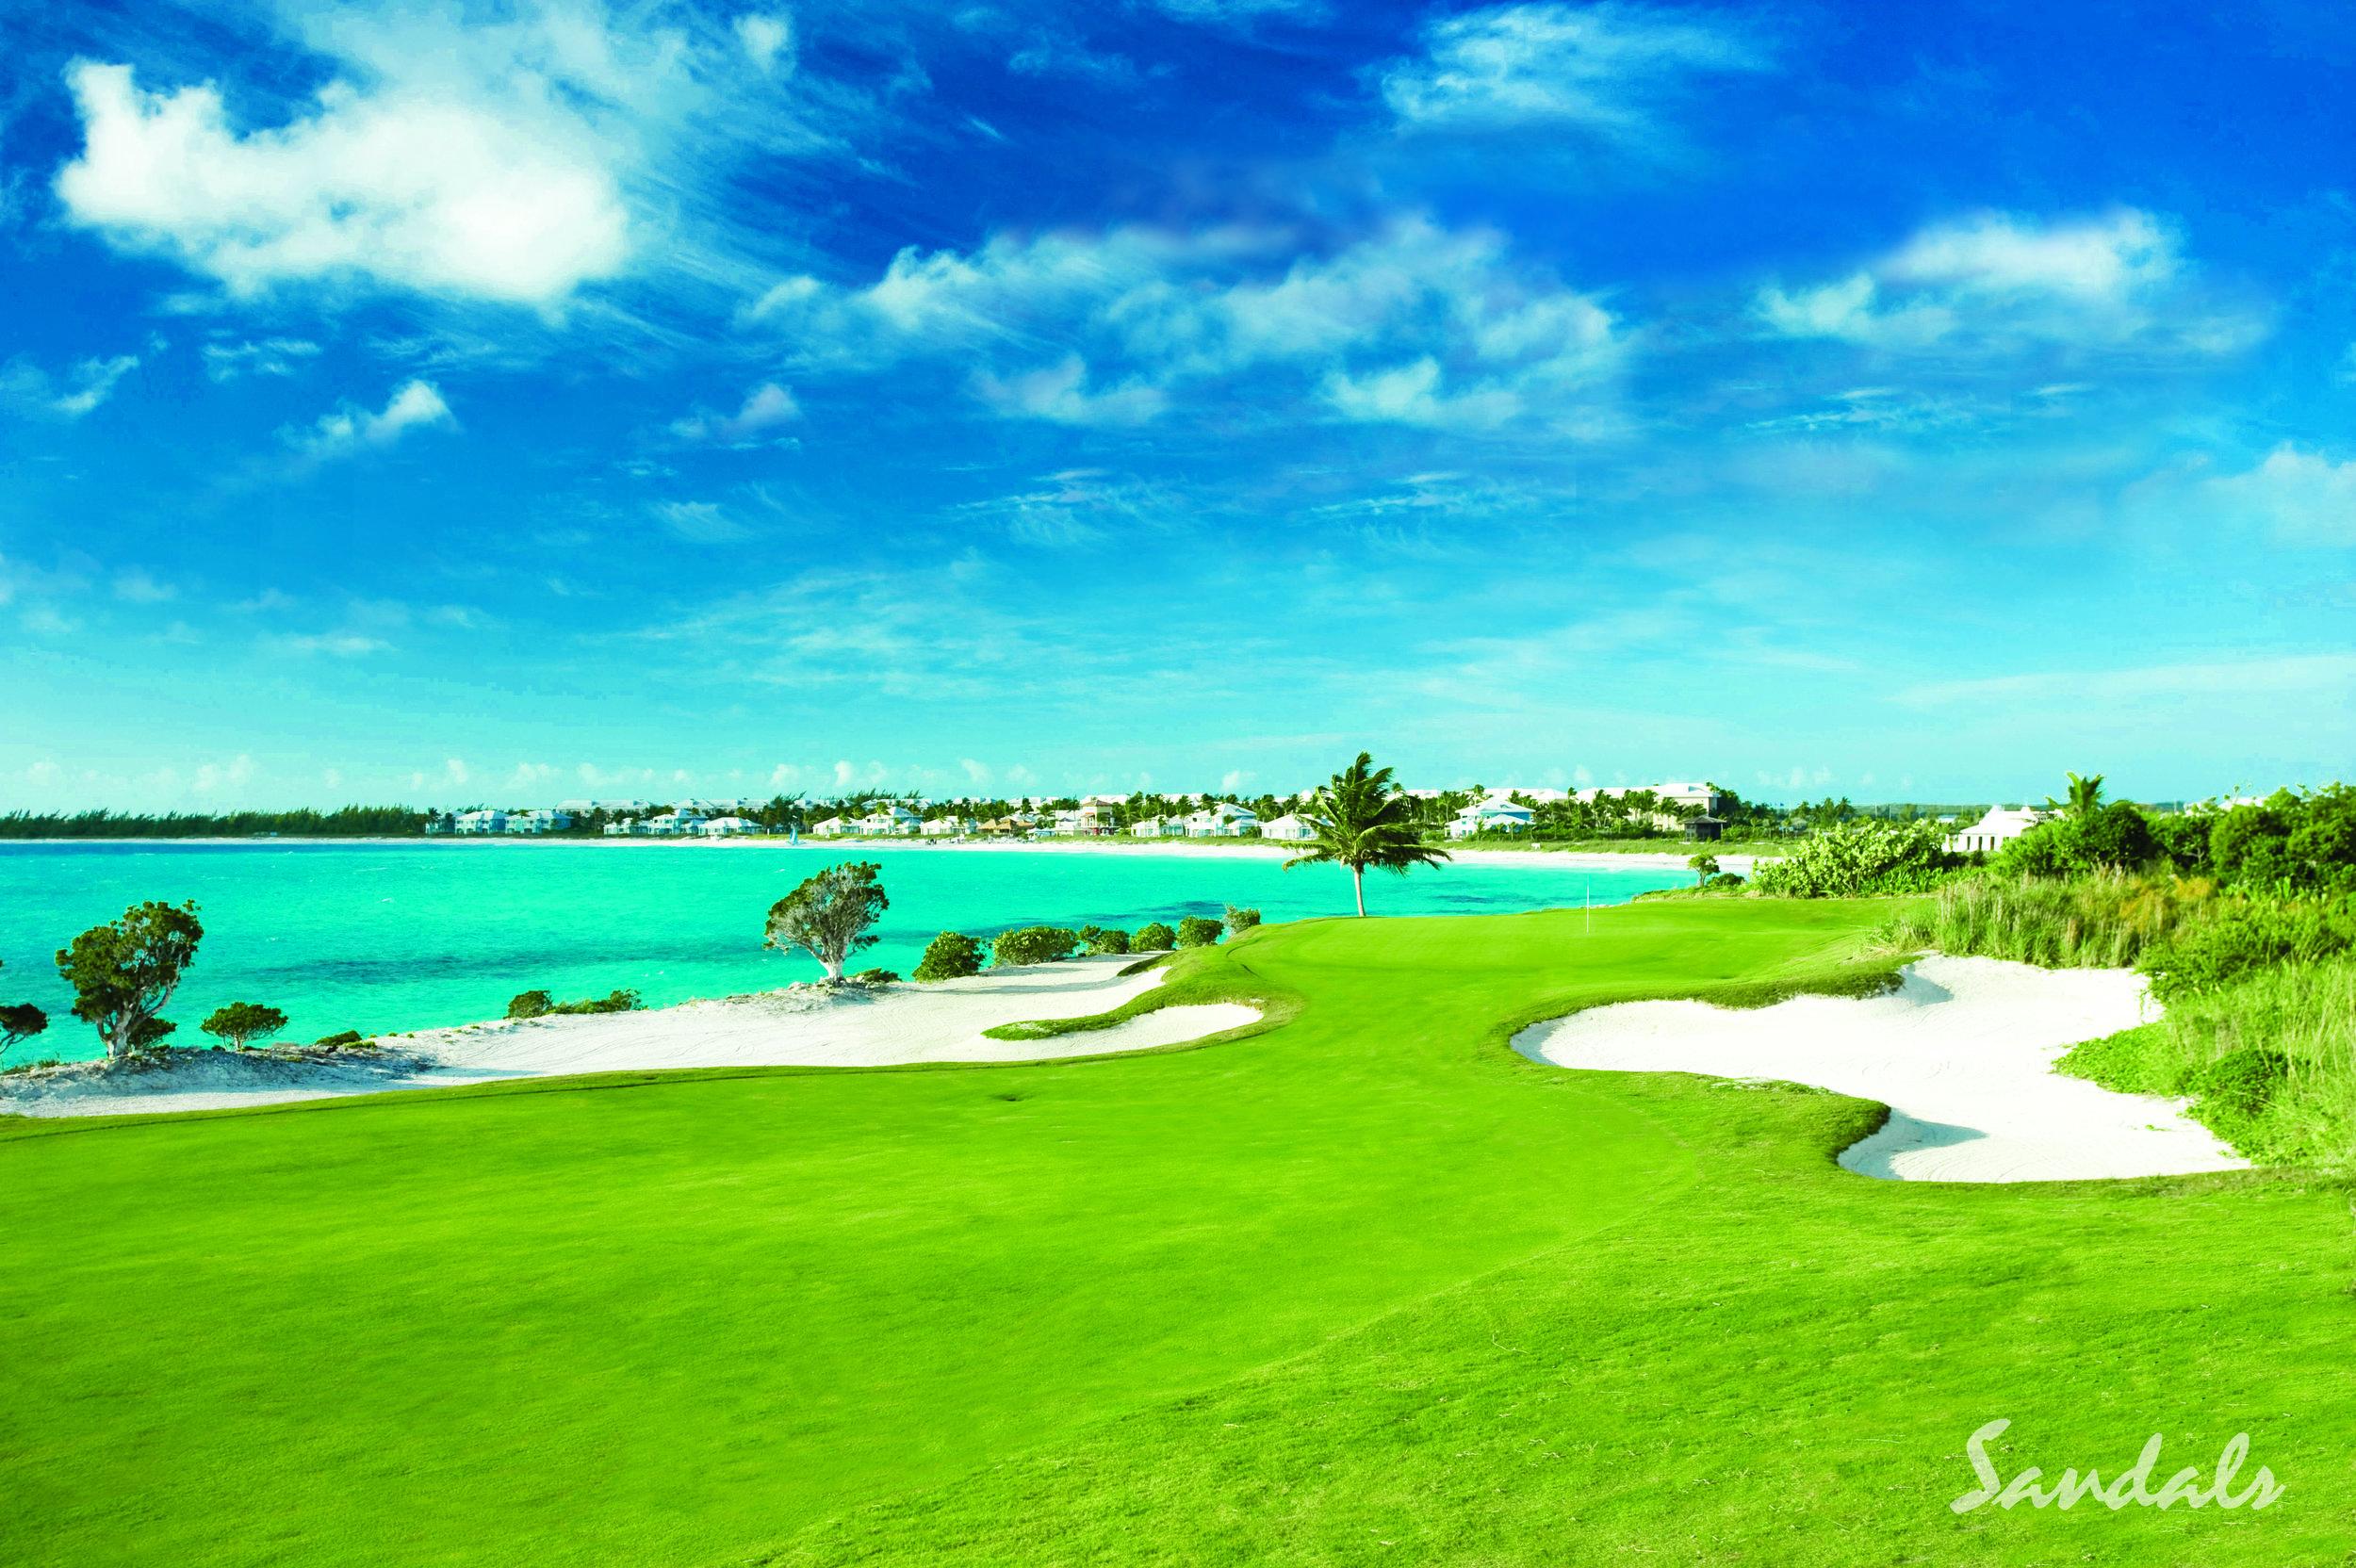 Trade EB_golf_course-5289softer.jpg